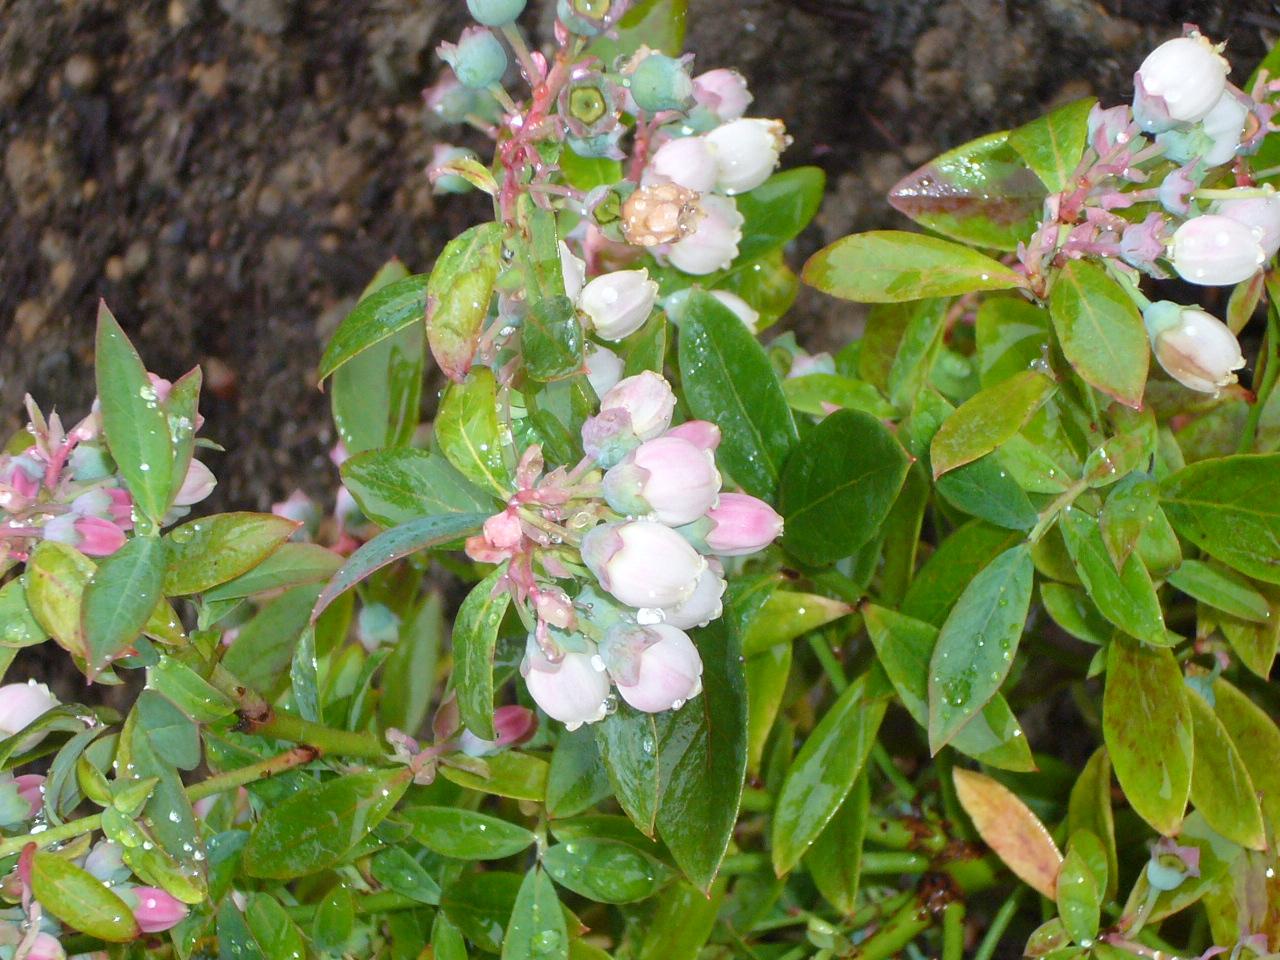 Congenial Vaccinium Evergreen Blueberry Evergreen Edibles Berries Fresh By Northwest Sunshine Blue Blueberry Bush Sunshine Blue Blueberry Plants Sale houzz-02 Sunshine Blue Blueberry